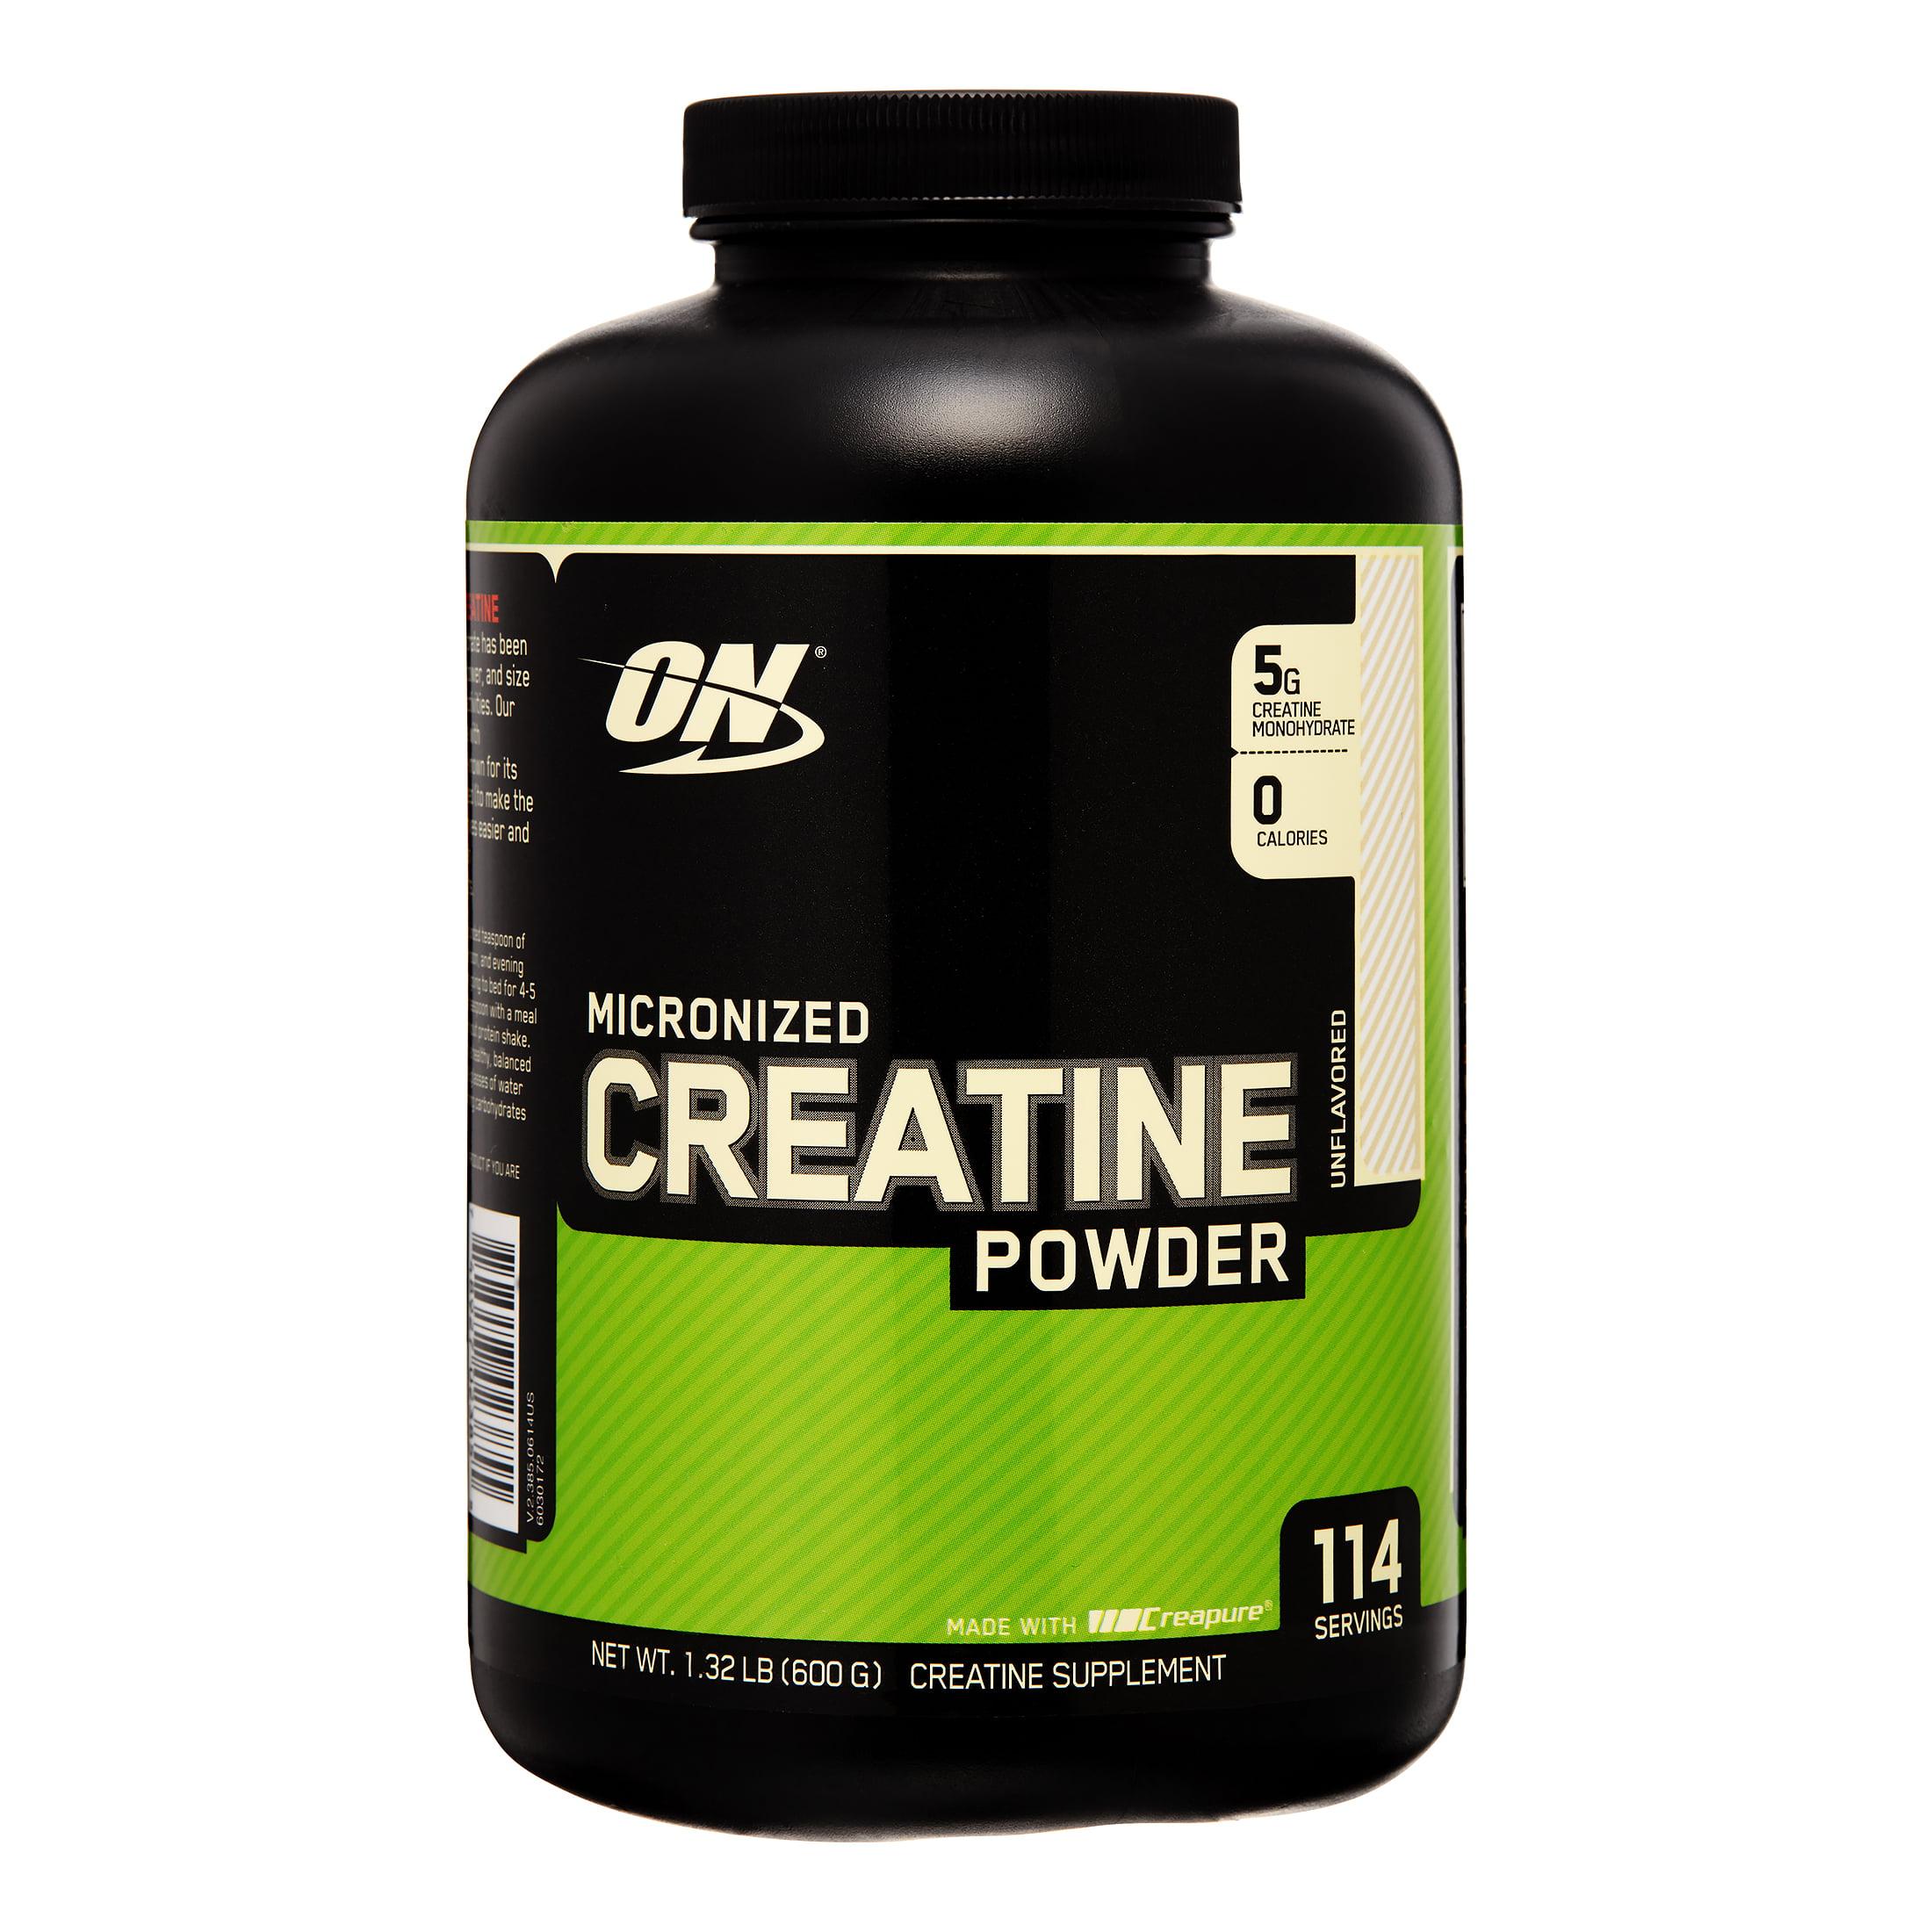 Optimum Nutrition Micronized Creatine Powder, 114 Servings